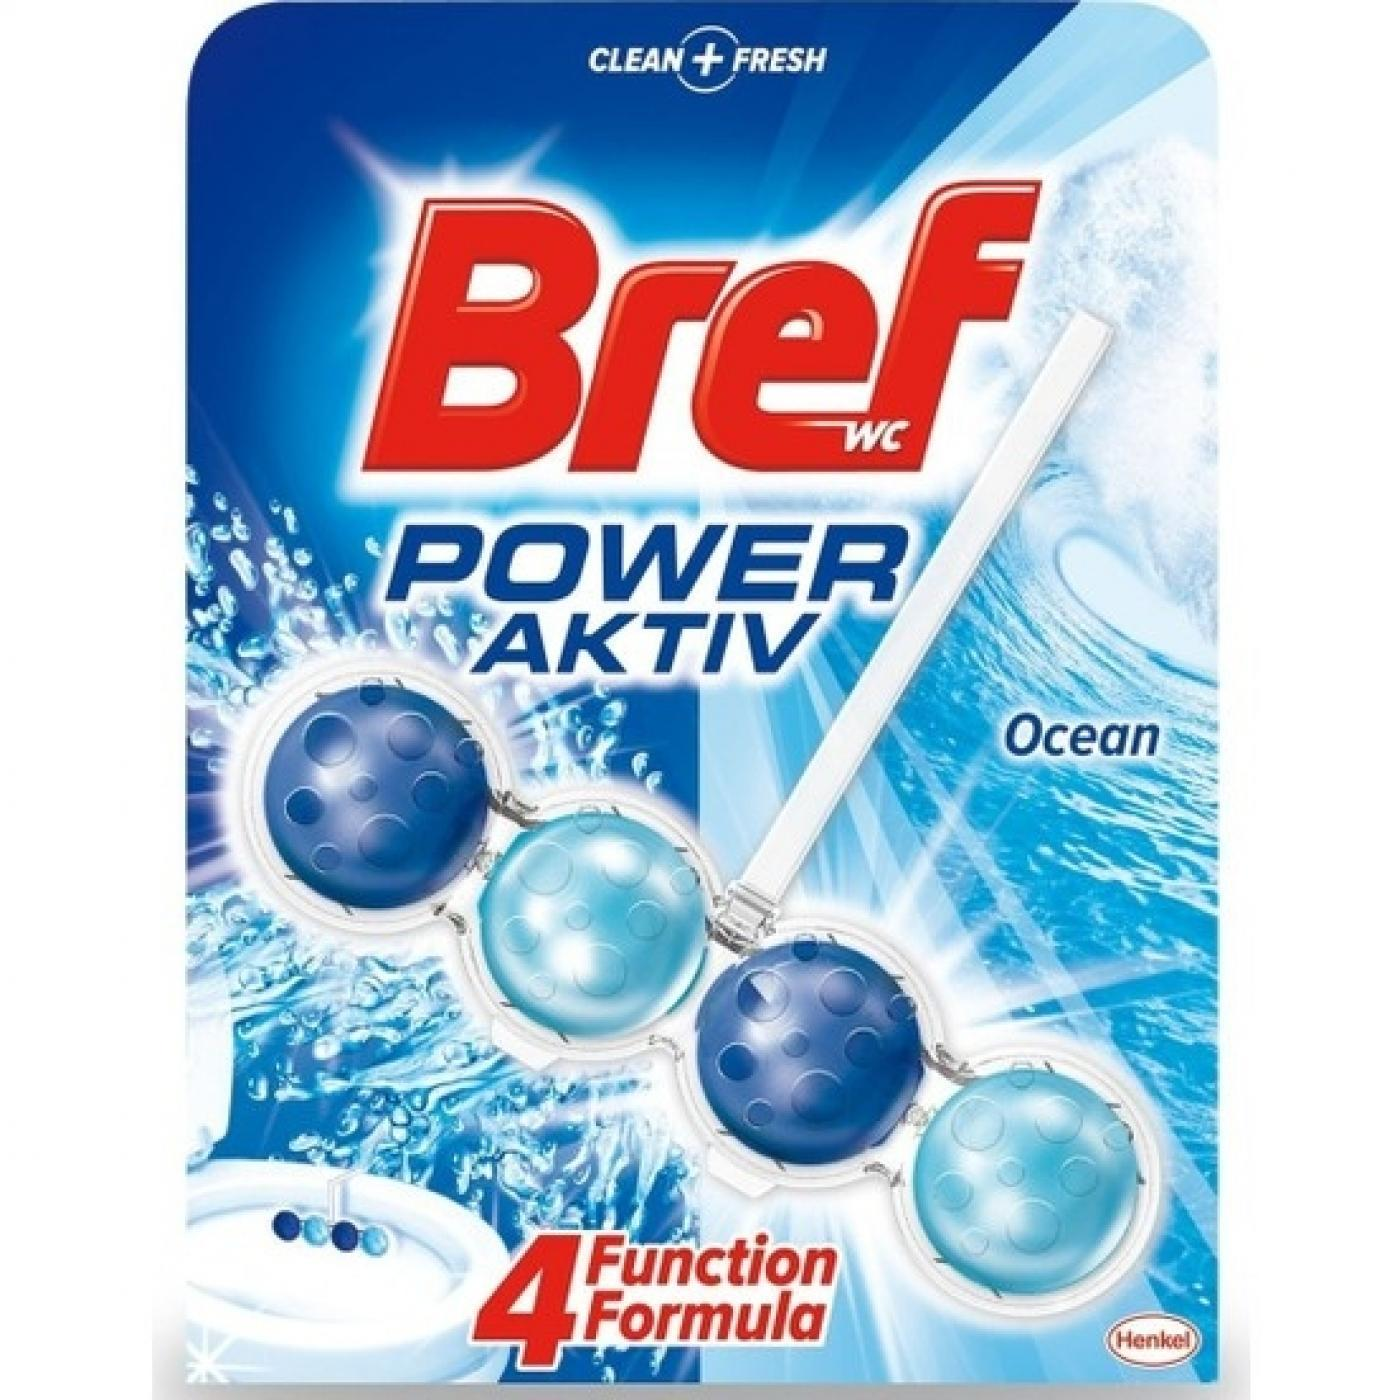 BREF POWER (TEKLİ) AKTİF TOPLAR 50GR OKYANUS